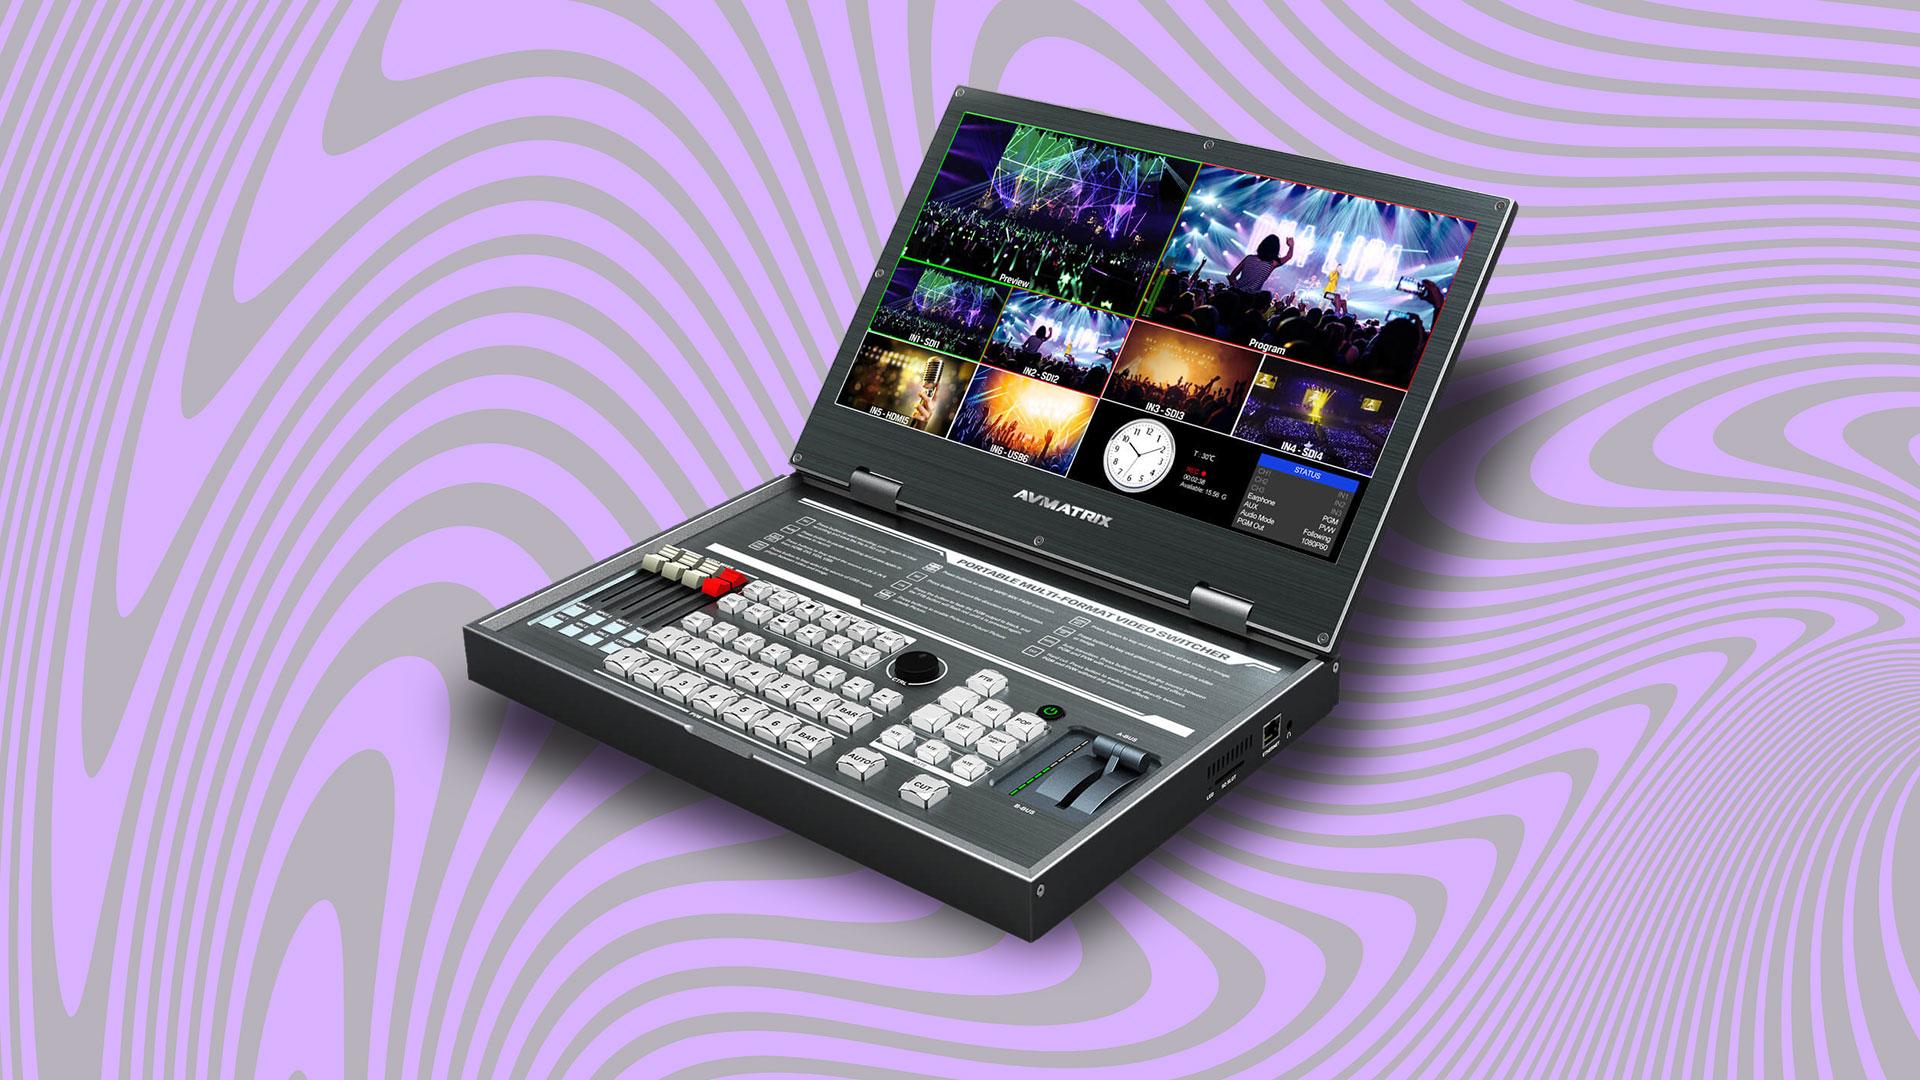 AVMATRIX PVS0615 Portable 6-Channel Video Switcher